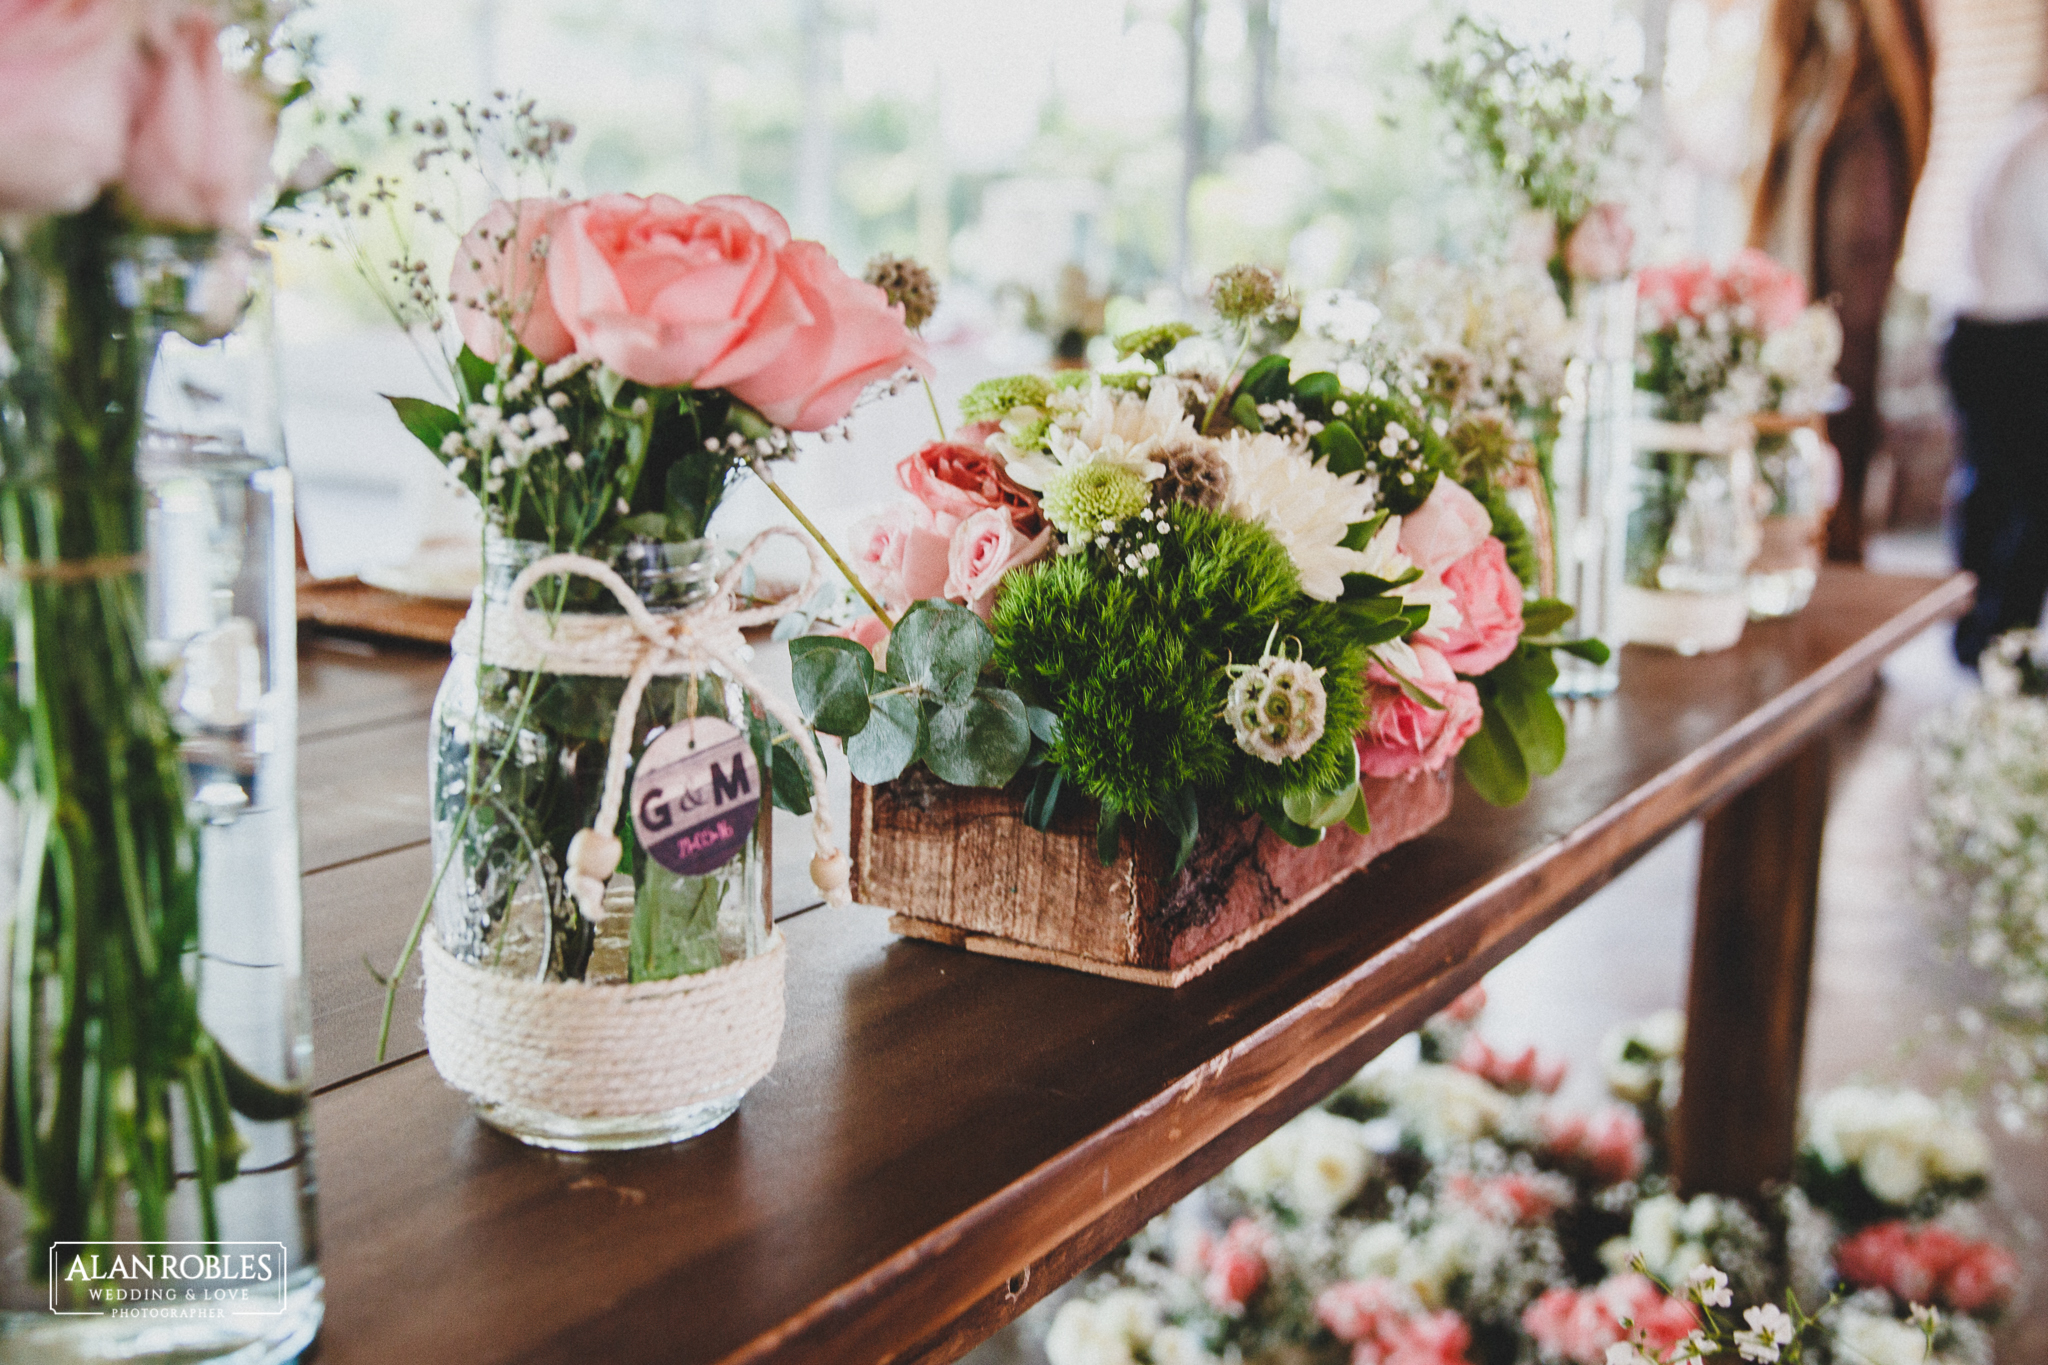 Arreglos de flores, centro de mesa para boda. Mesa de los novios. Fotografo de bodas Alan Robles.